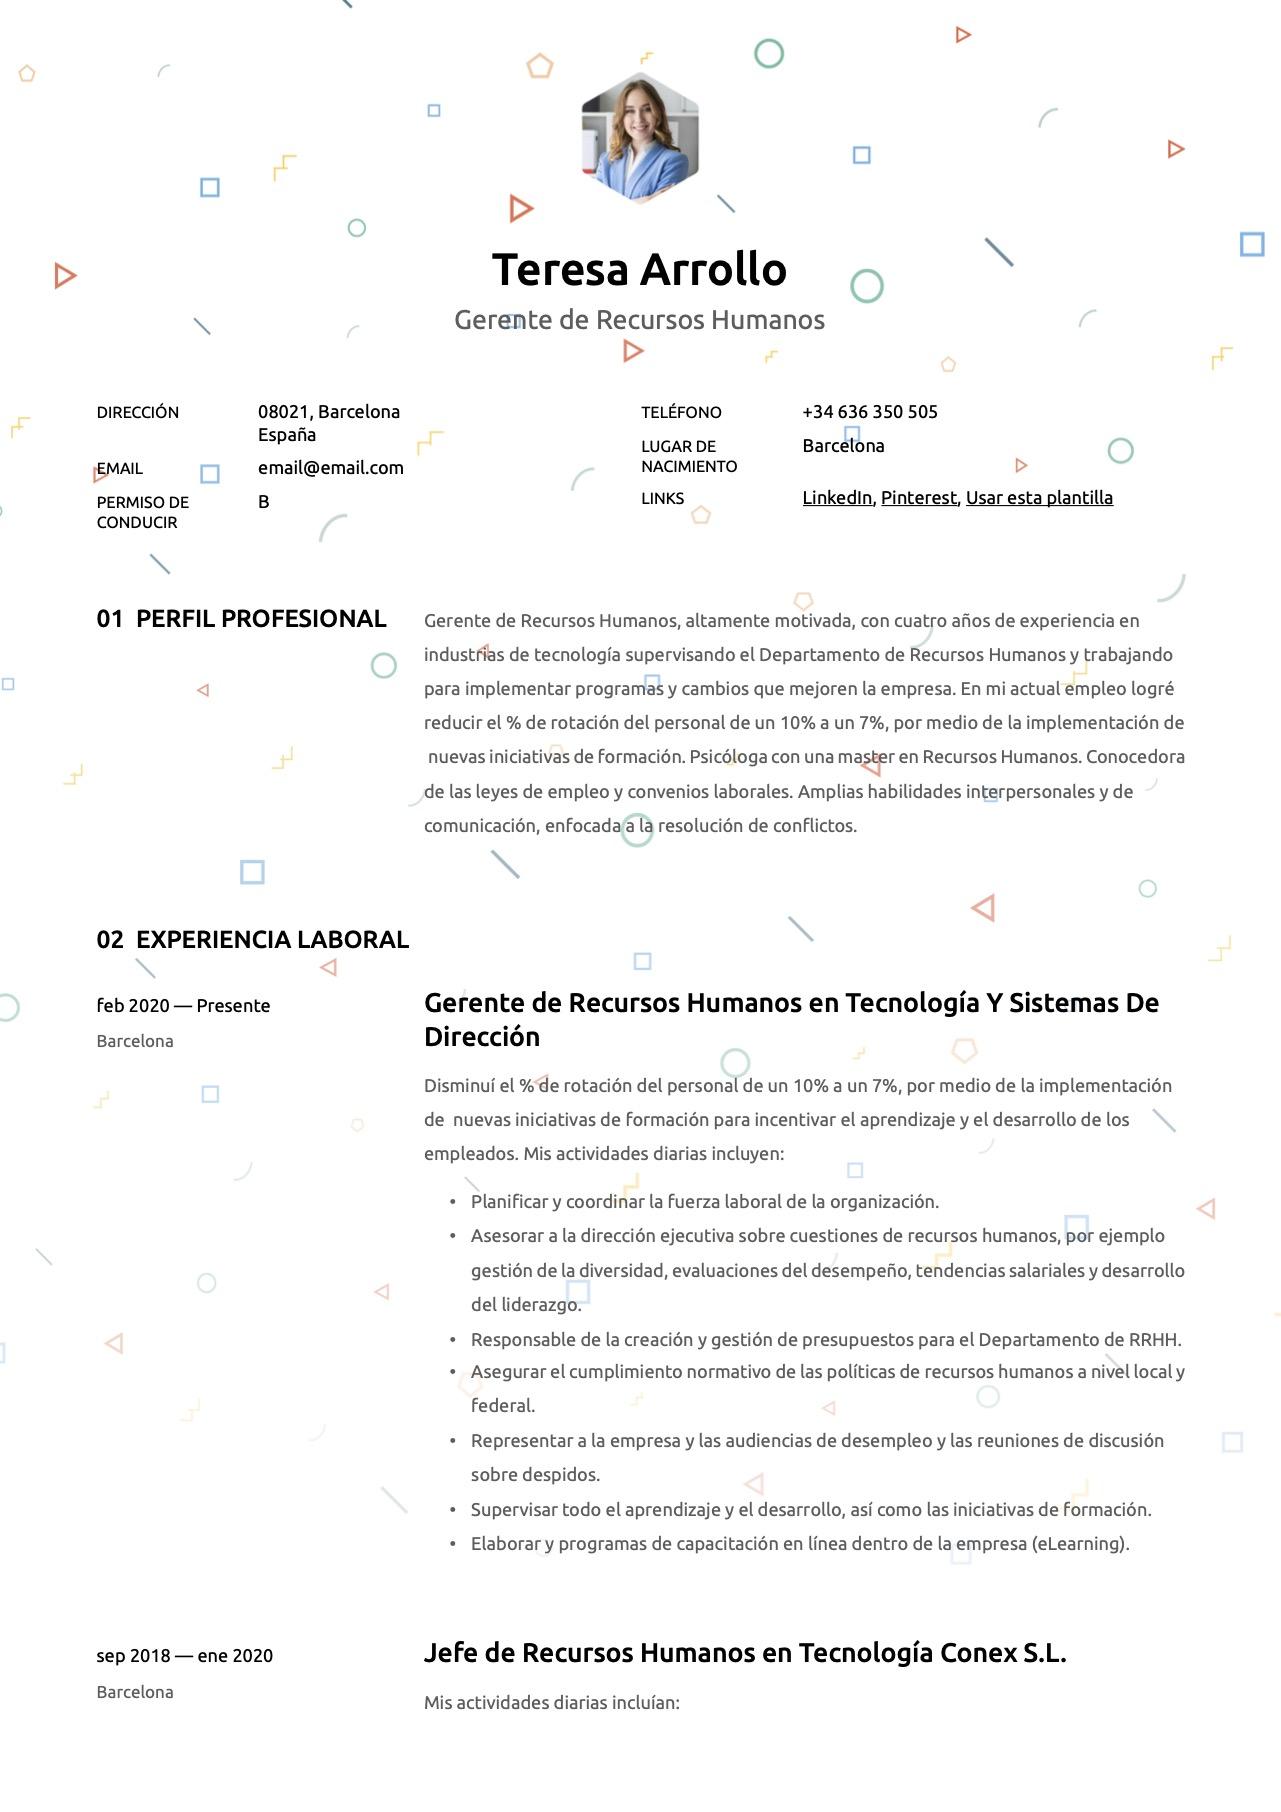 Plantilla de CV para Recursos Humanos